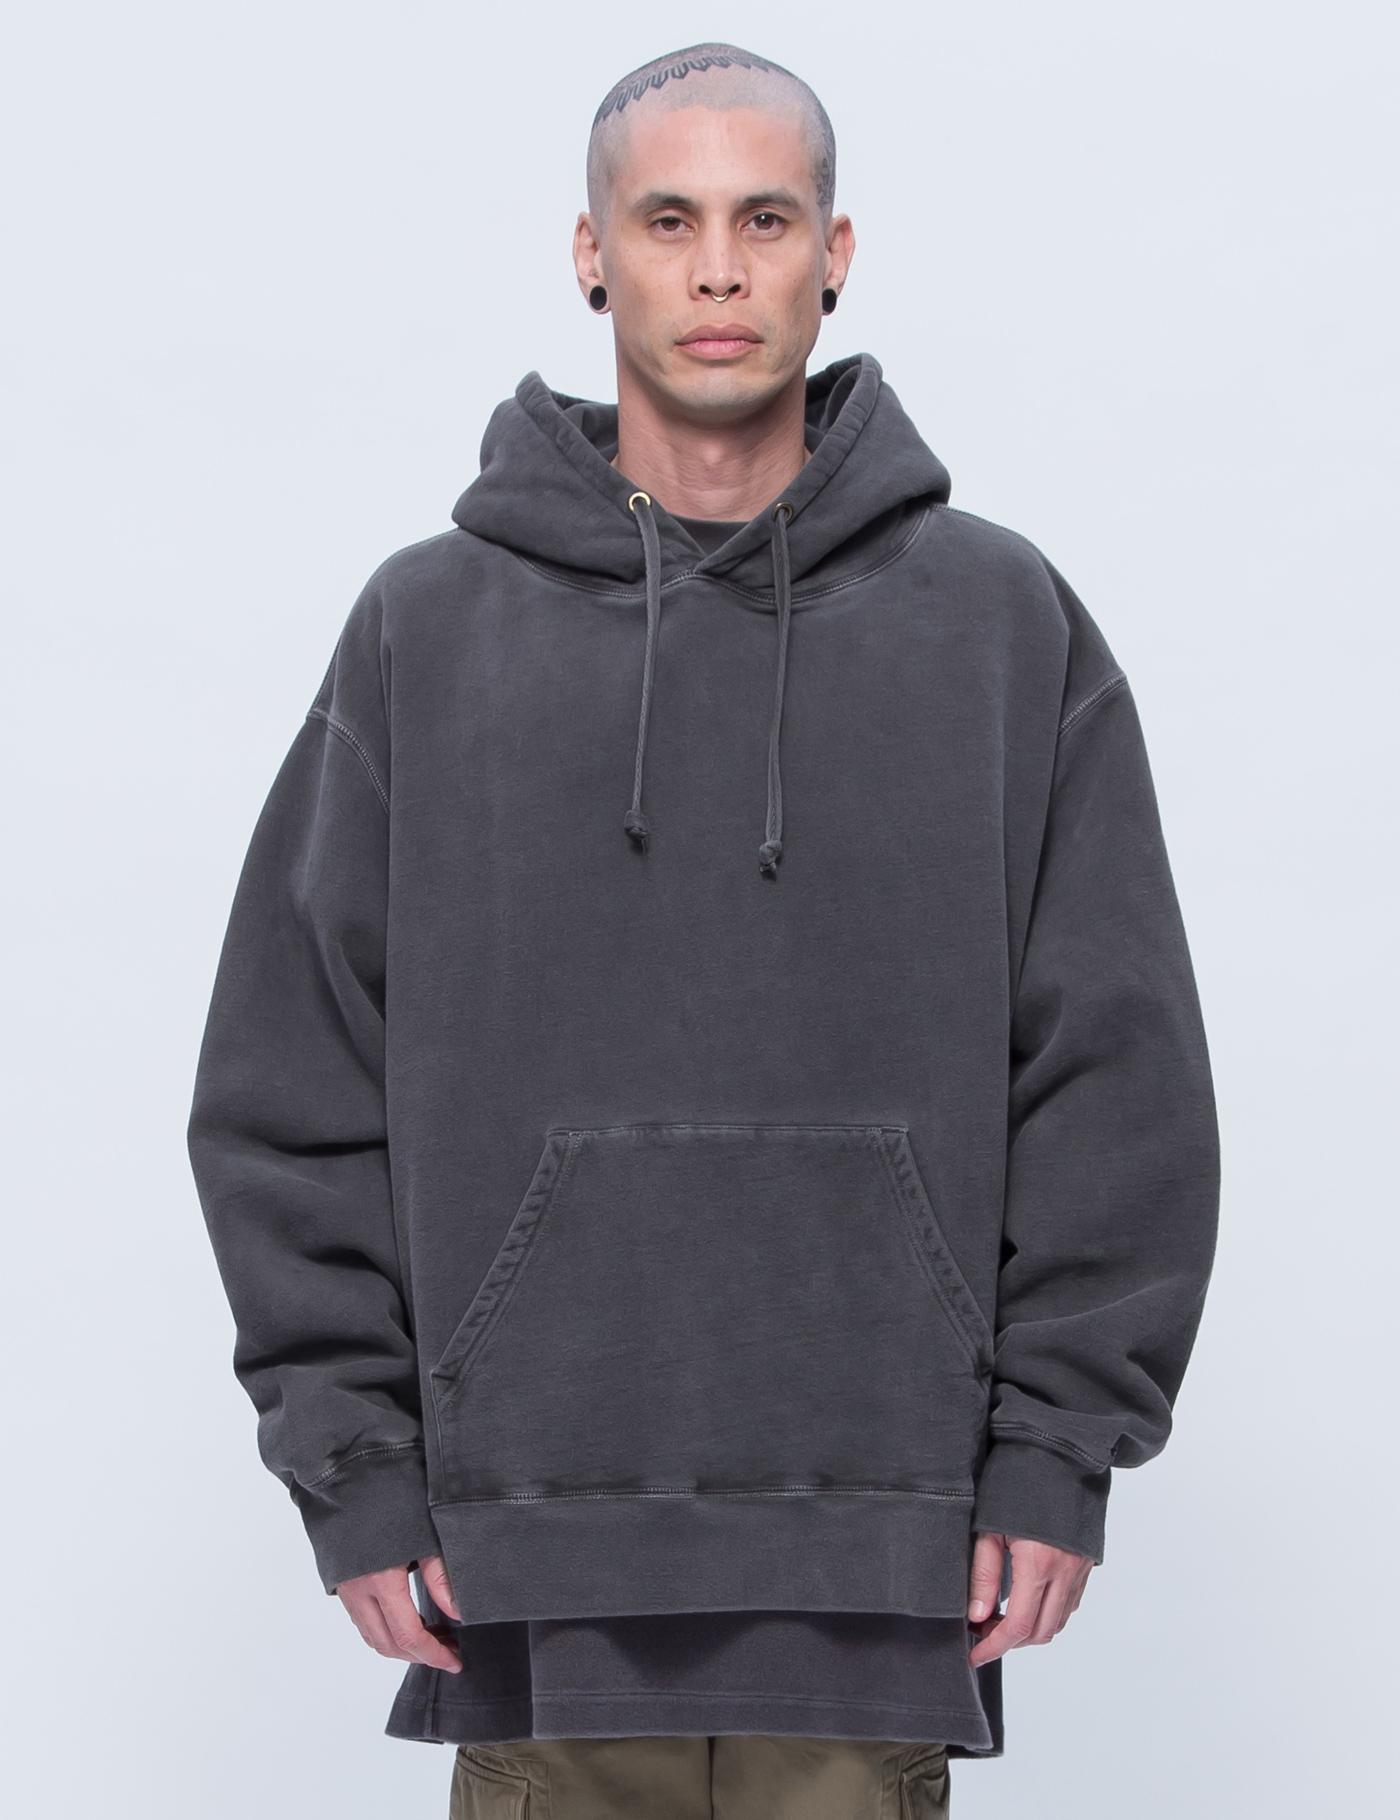 yeezy season 3 relaxed fit hoodie hbx